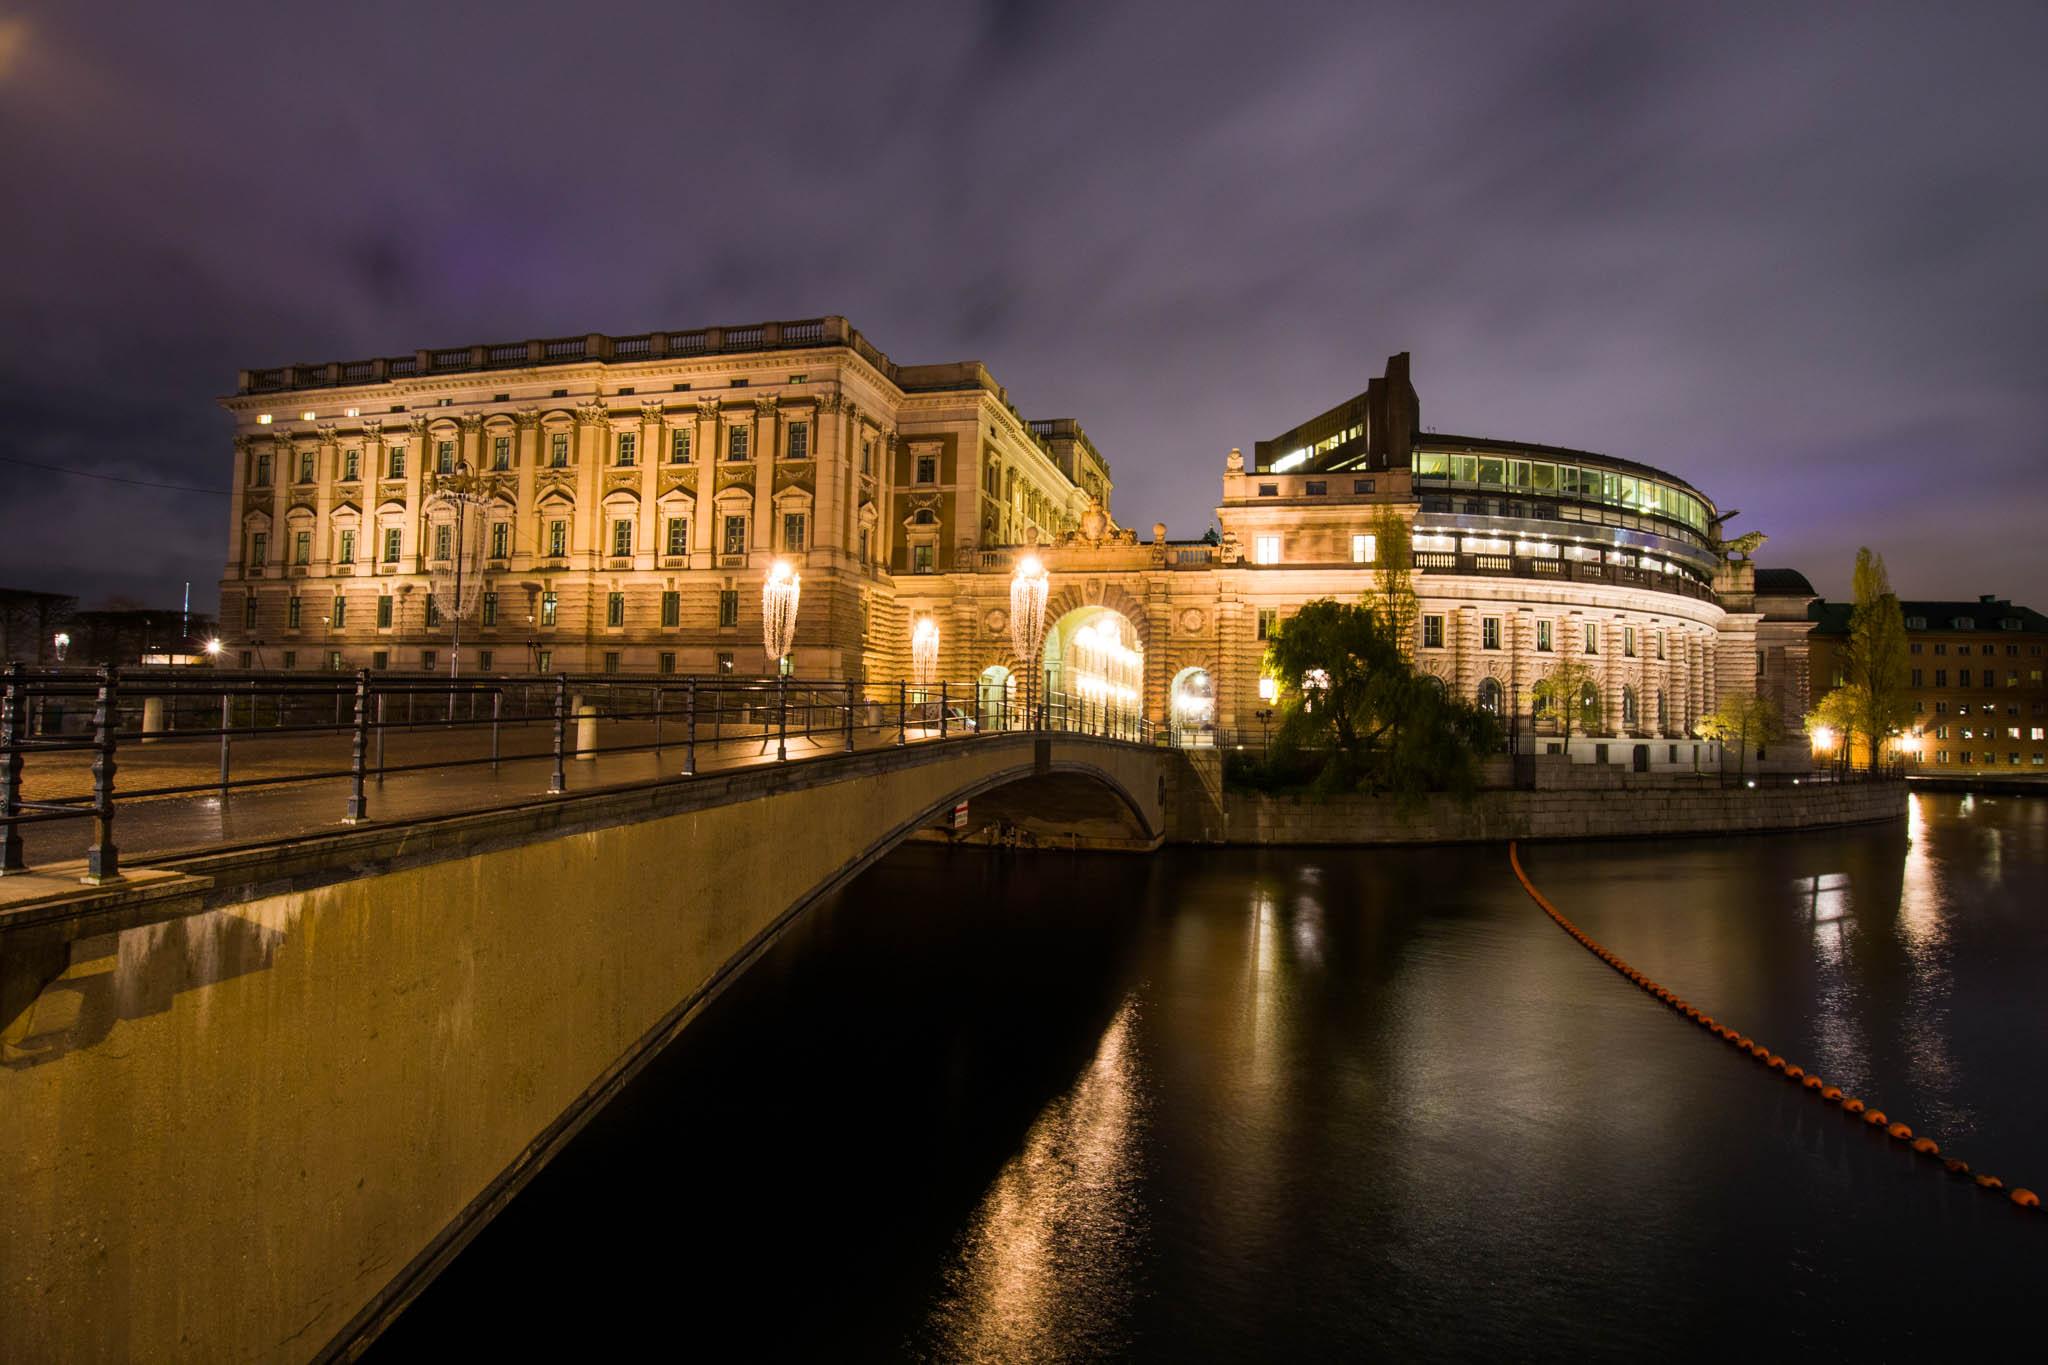 Stockholm Nov 2017